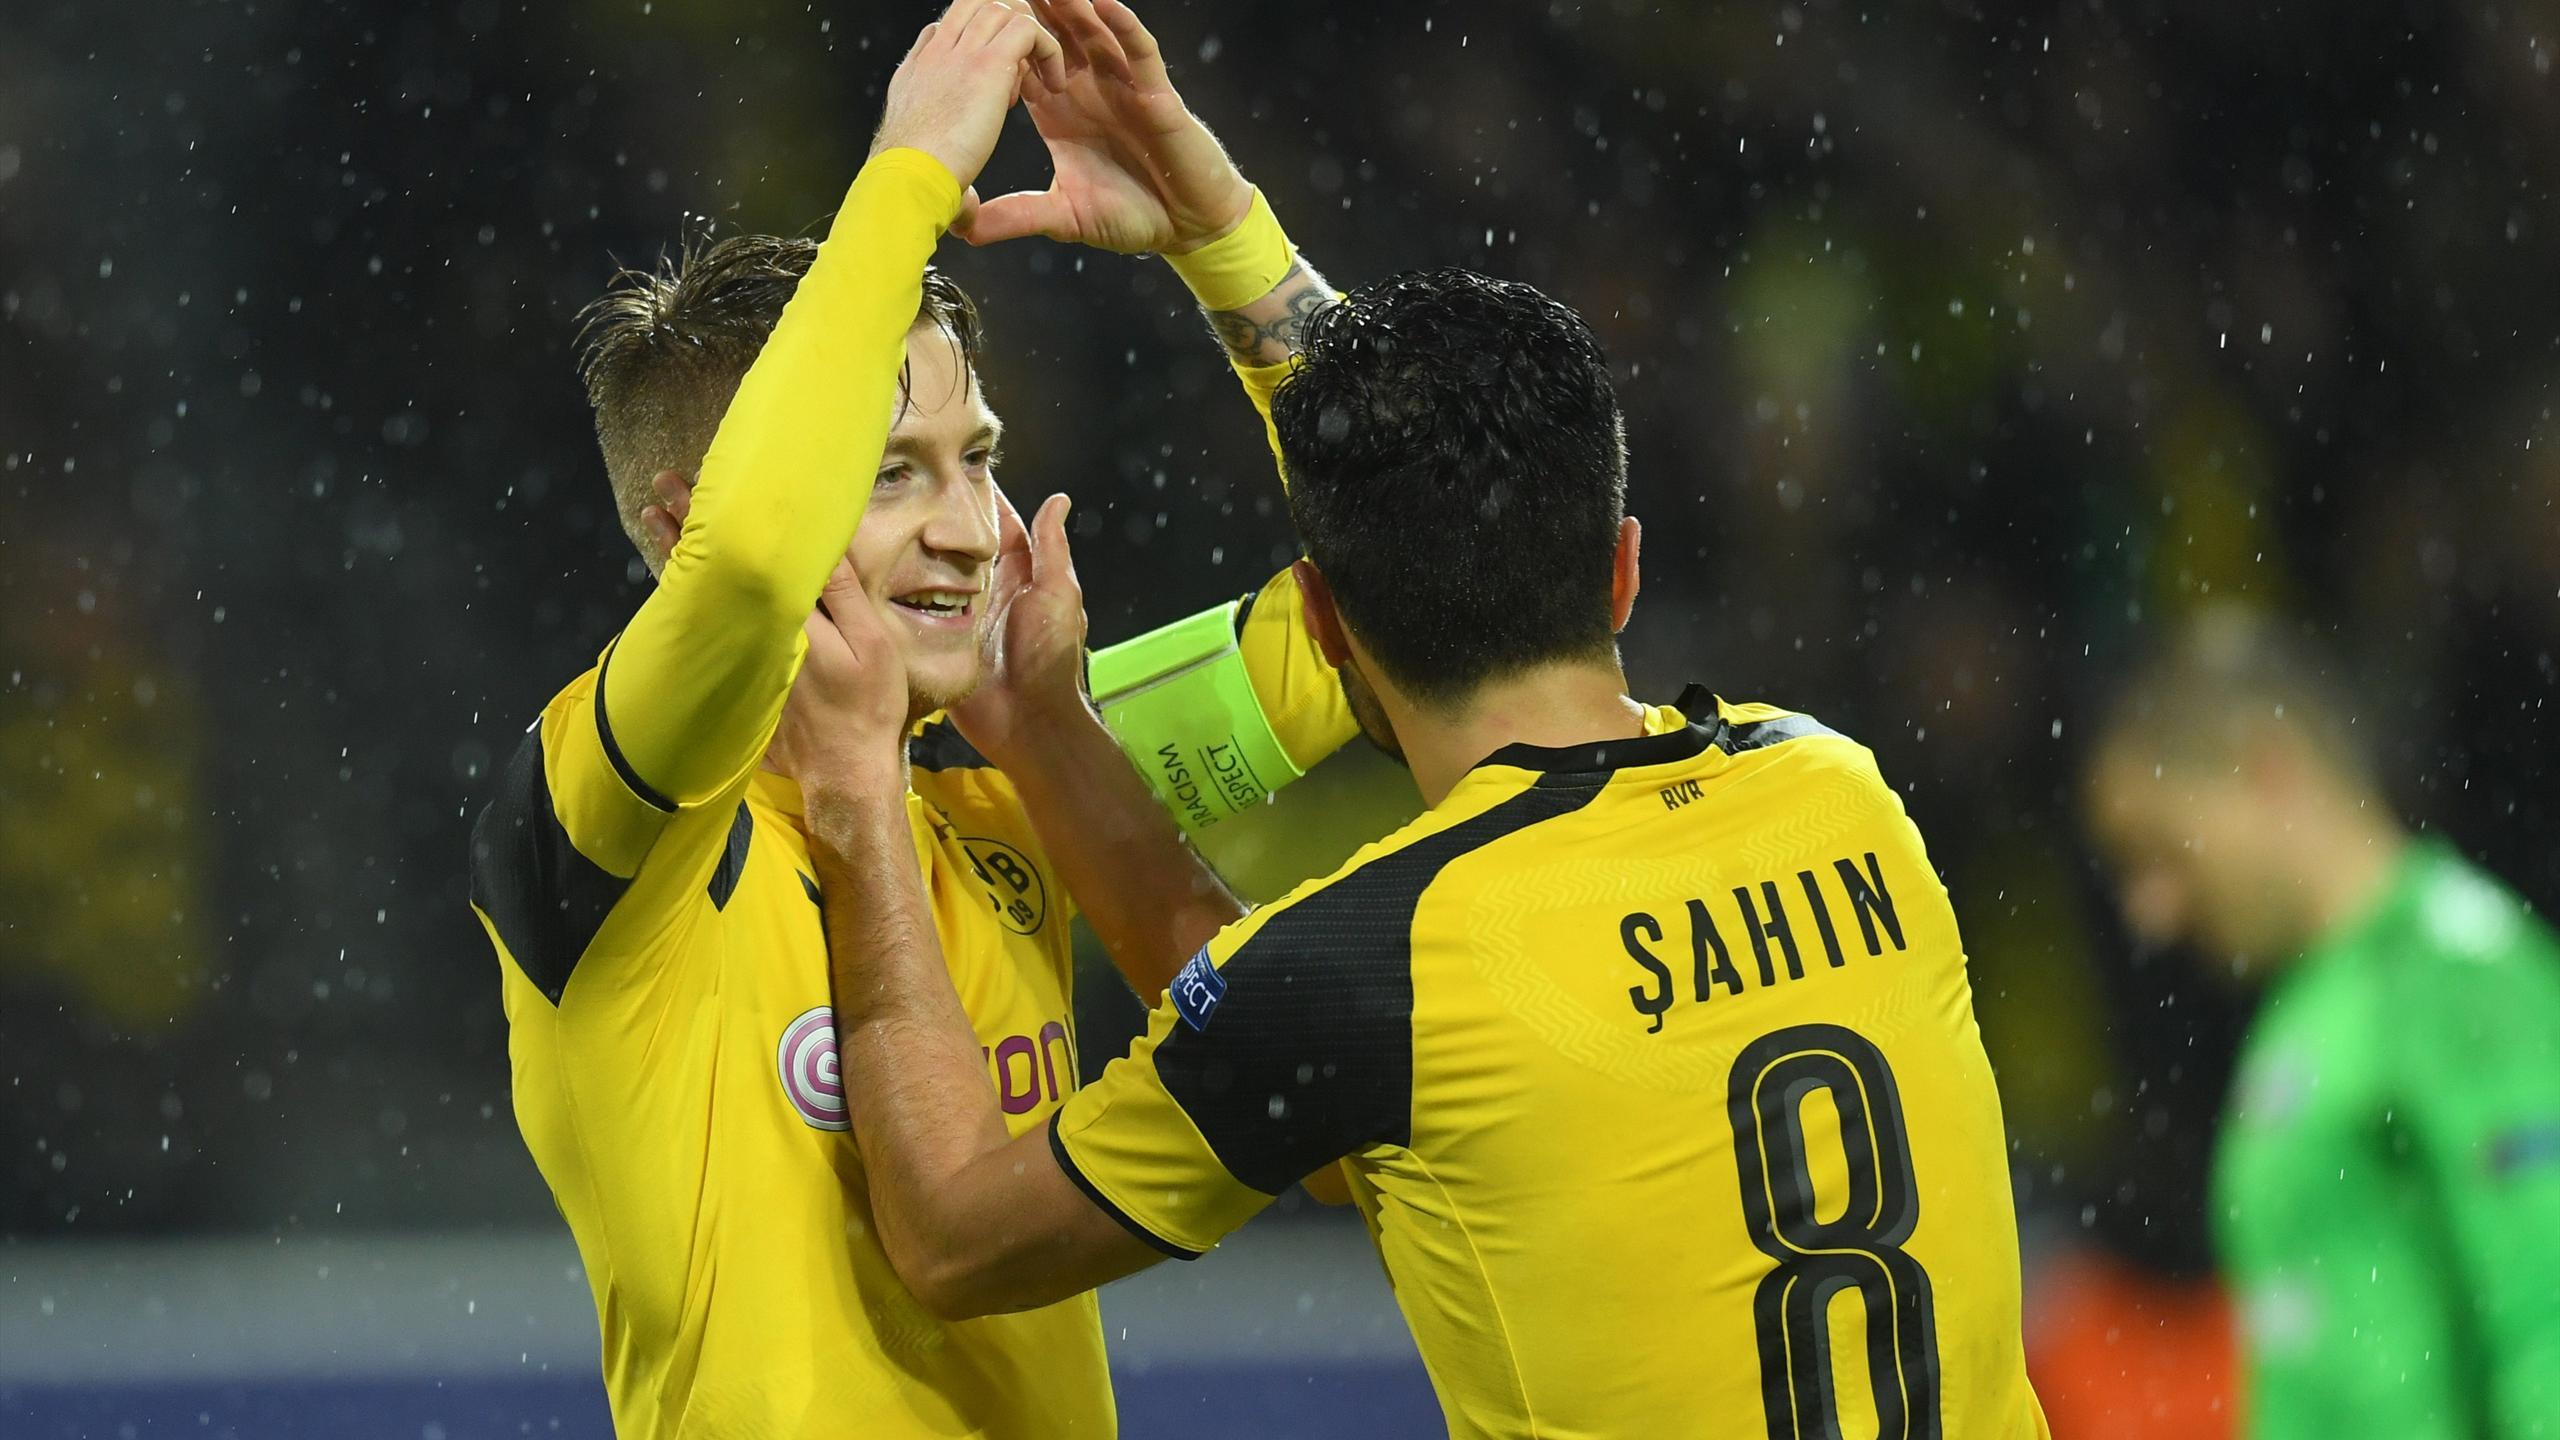 Marco Reus & Nuri Sahin (Borussia Dortmund)